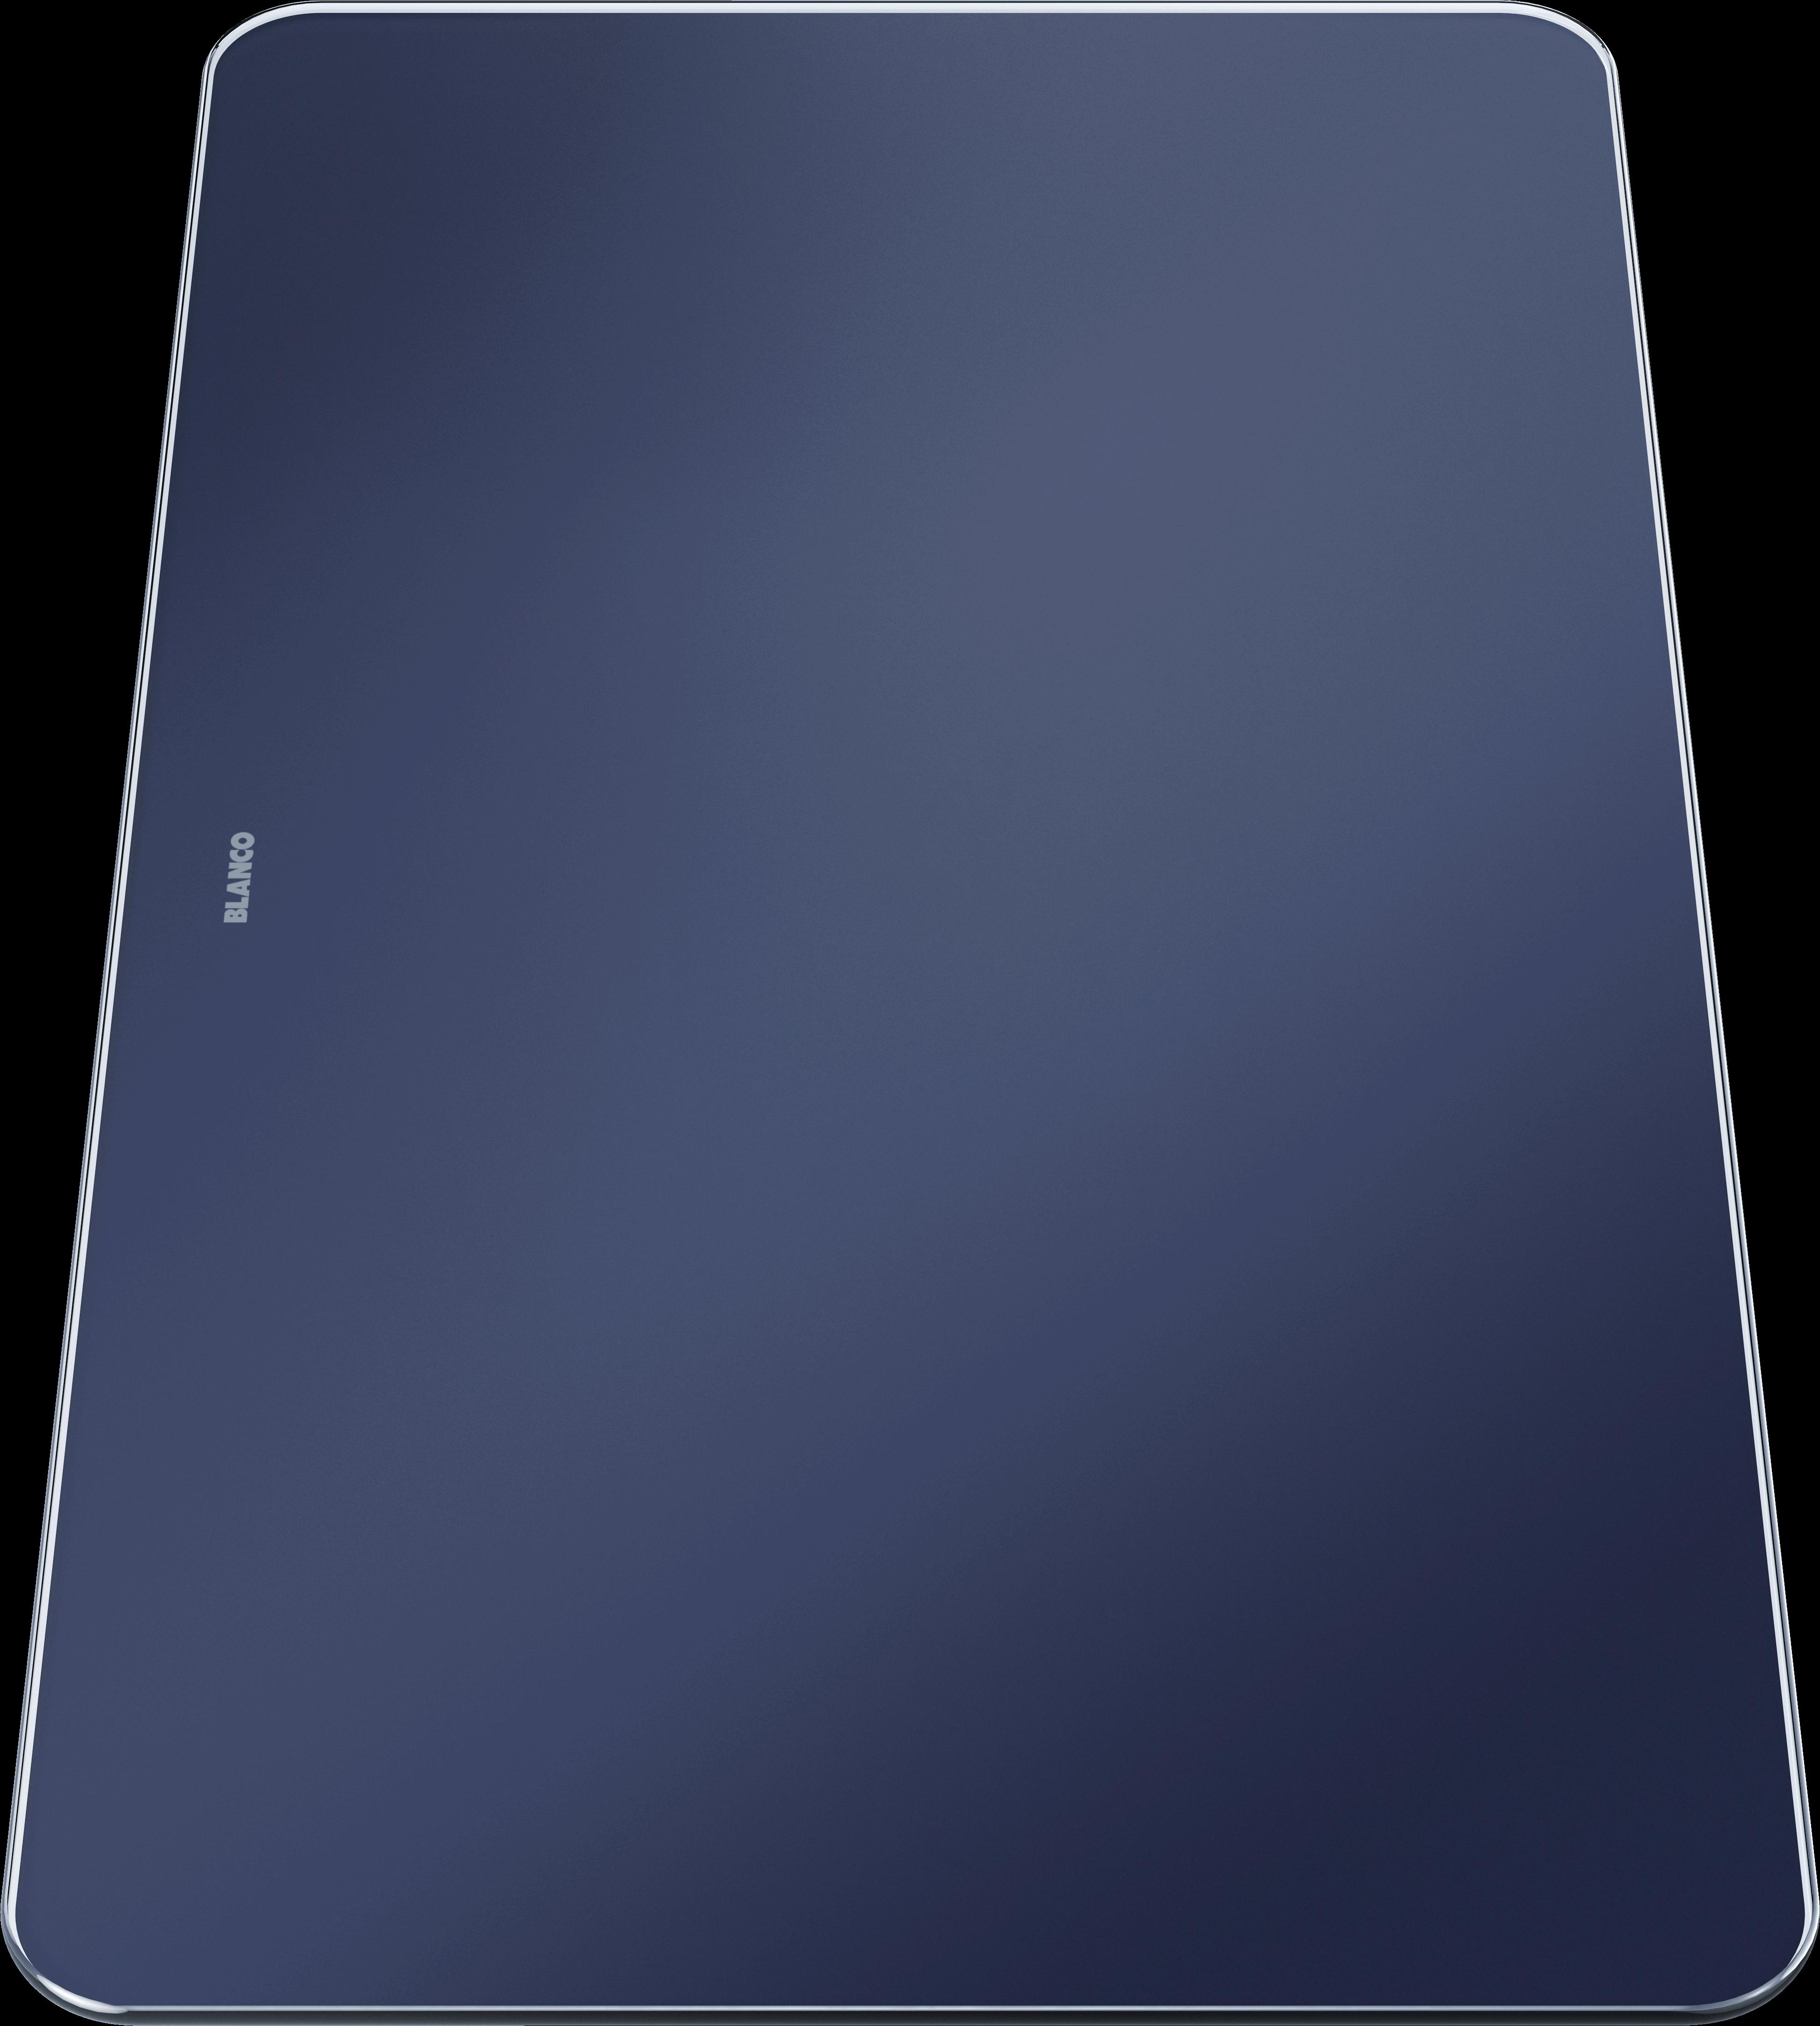 Glass cutting board in velvety matt night blue